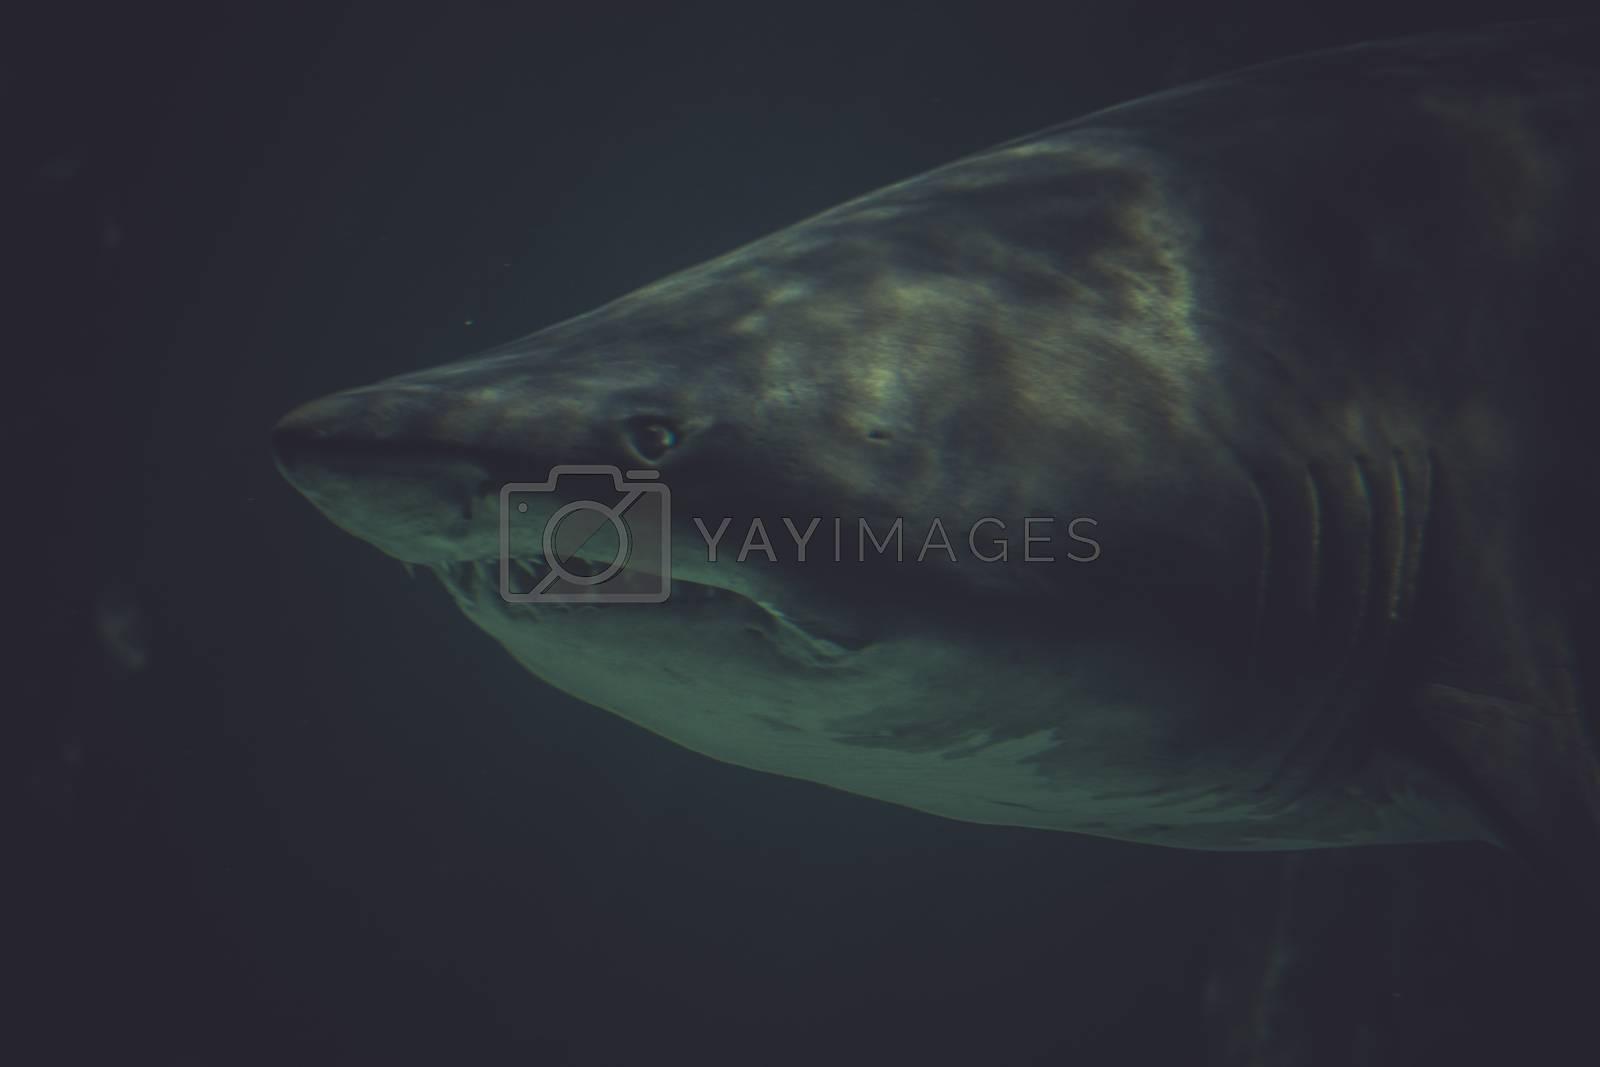 scuba, Great Shark Underwater Photo  in the deep blue water.